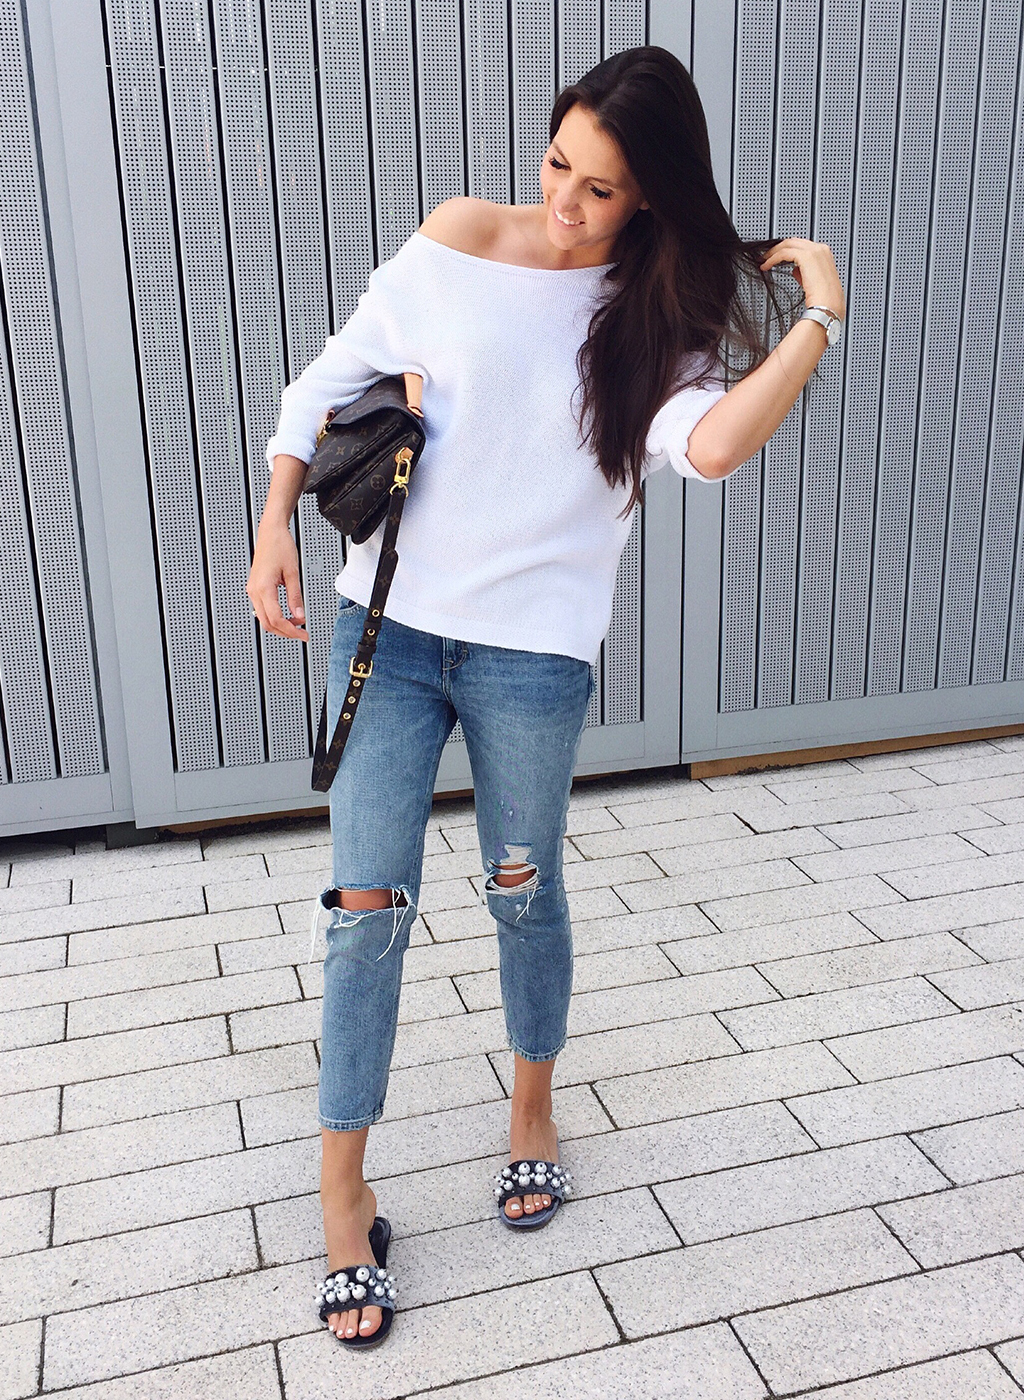 Perlen Pantoletten Outfit